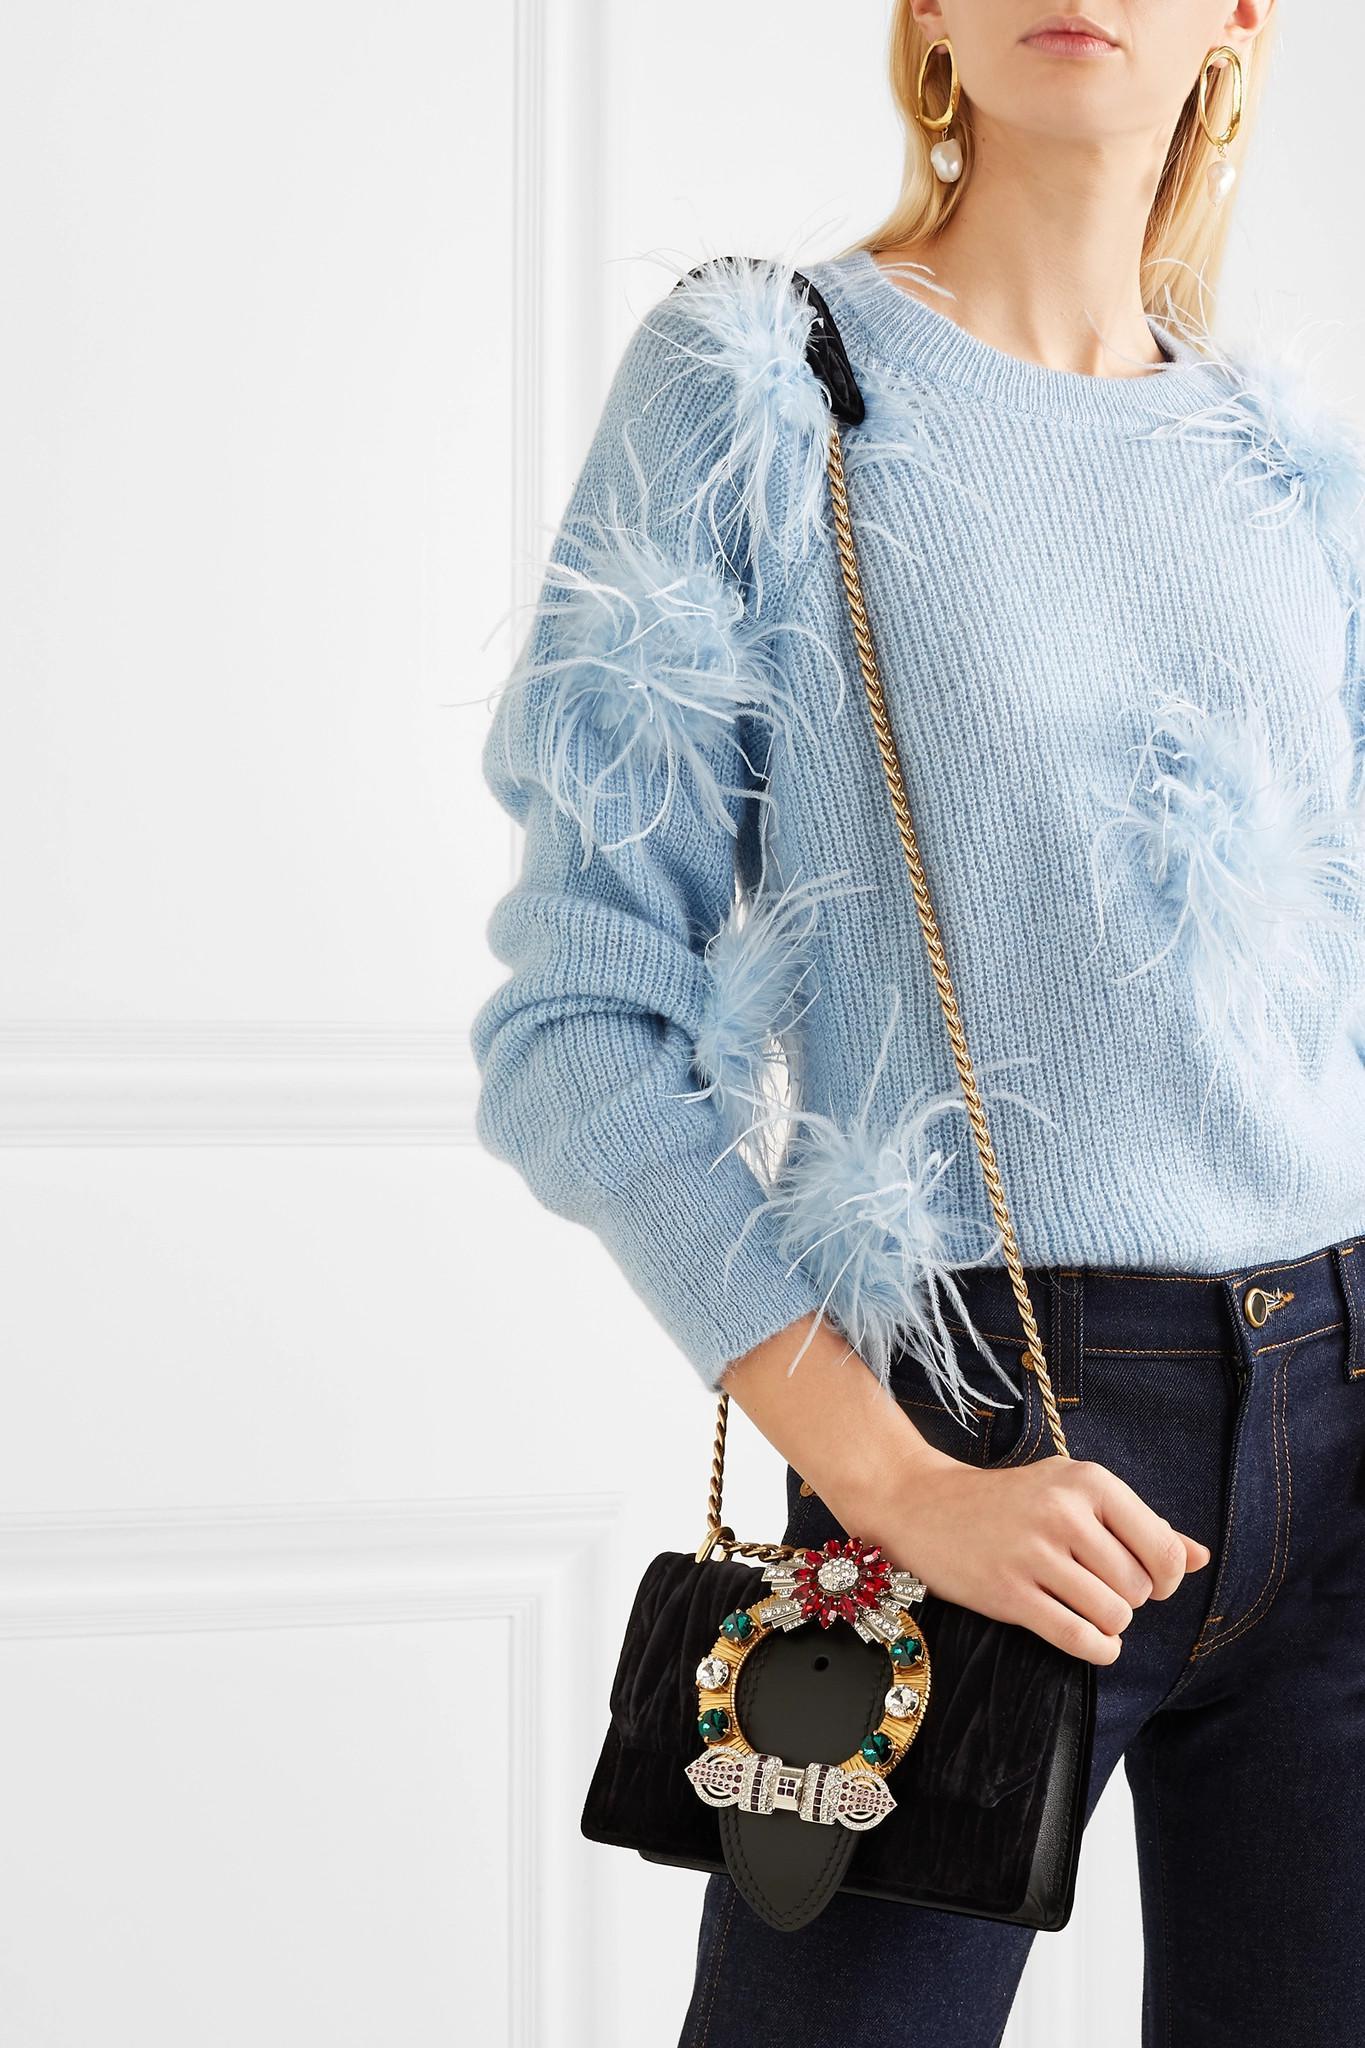 ... Miu Lady Crystal-embellished Leather And Matelassé Velvet Shoulder Bag  -. View fullscreen 7b67c942d5fdd